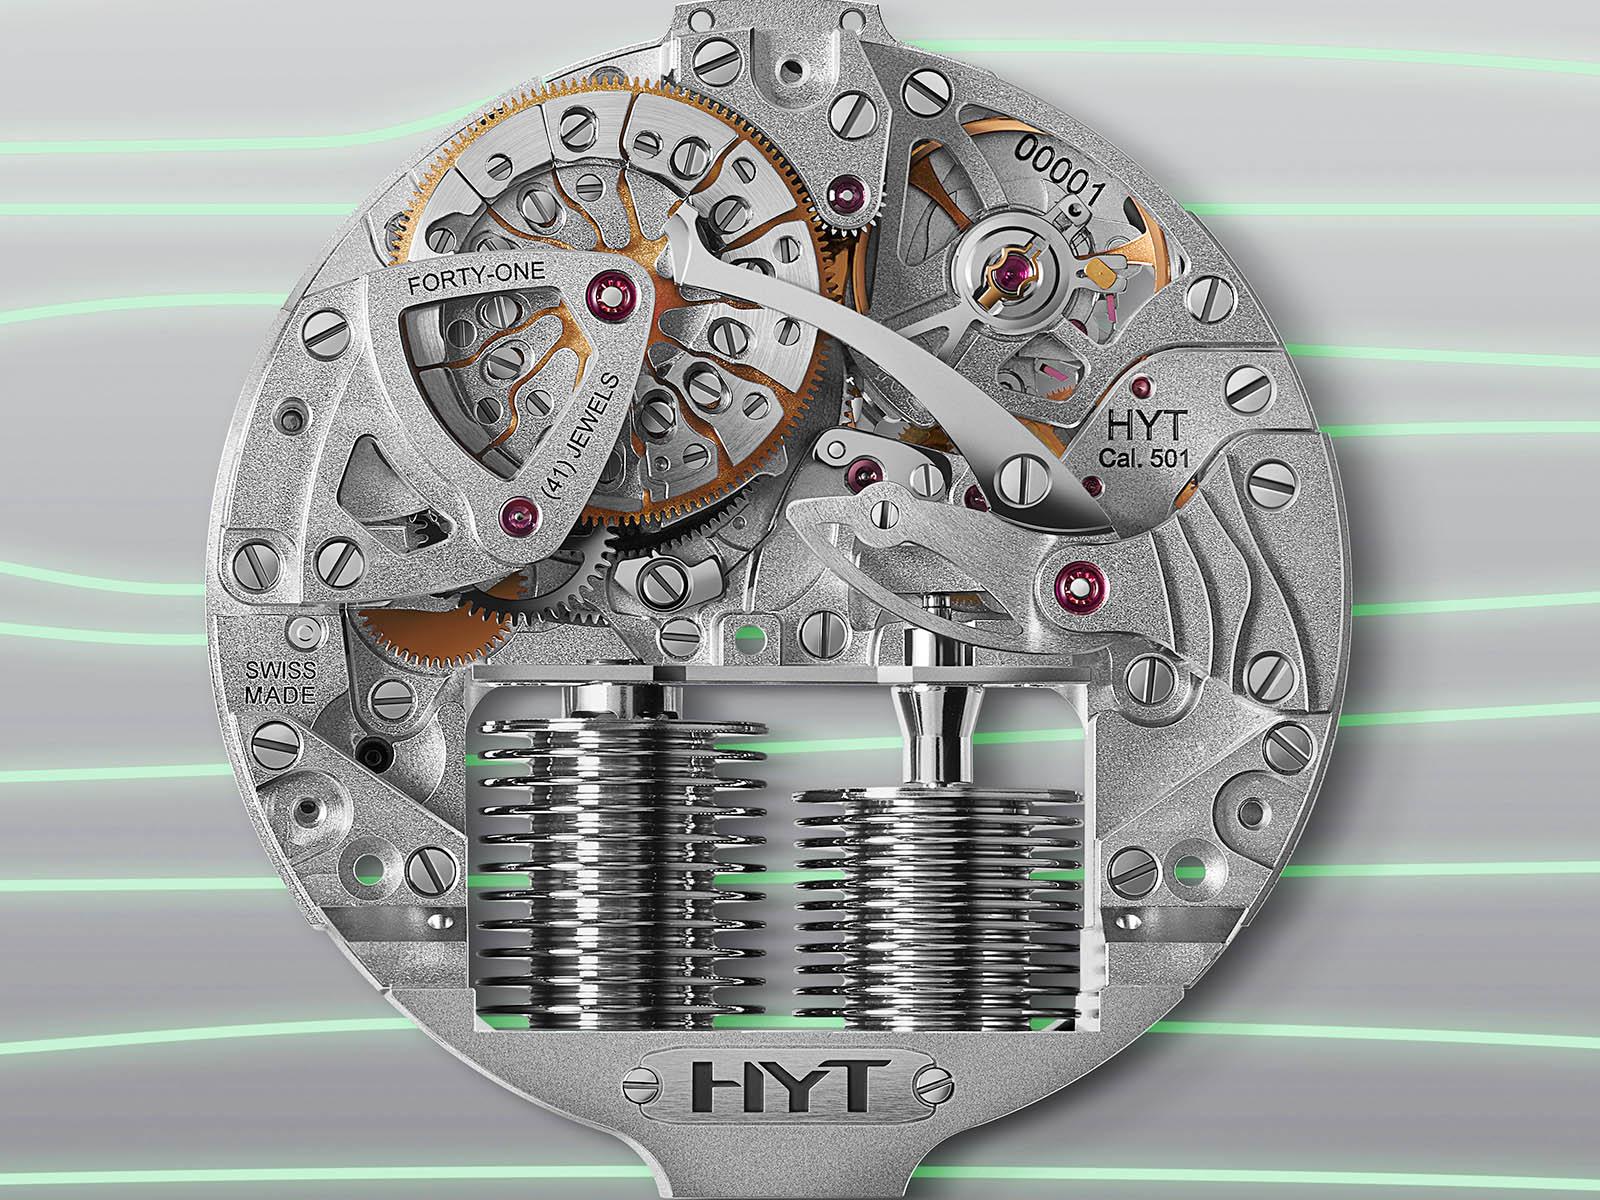 hyt-h5-4.jpg